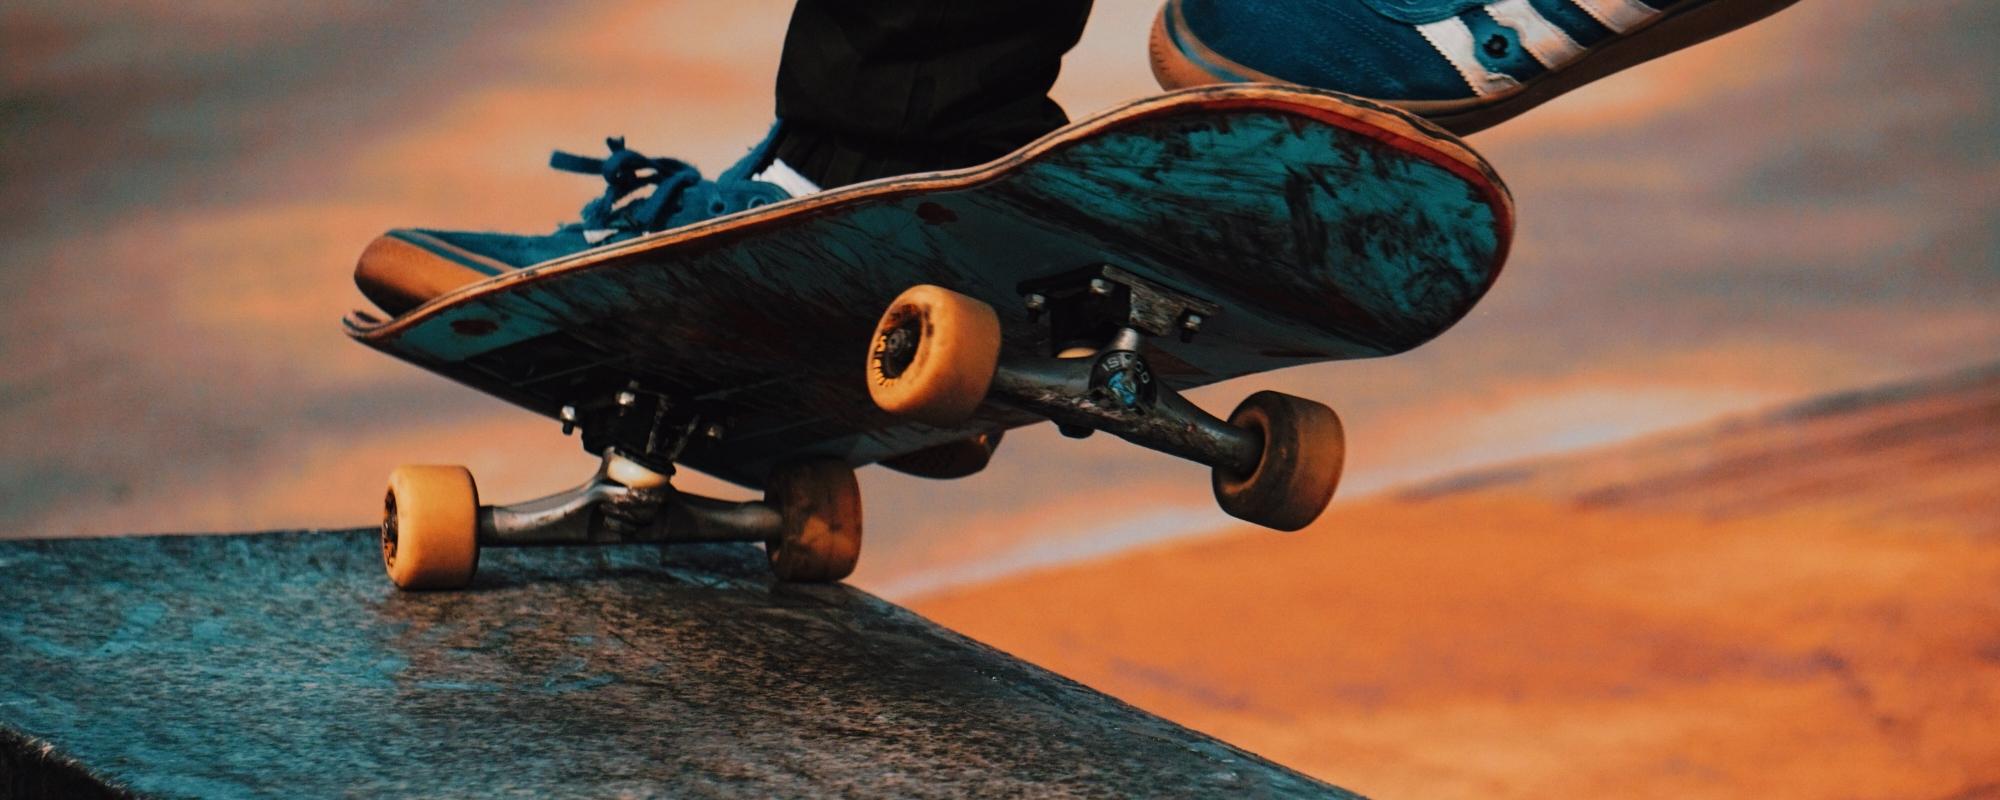 En person som åker skateboard.